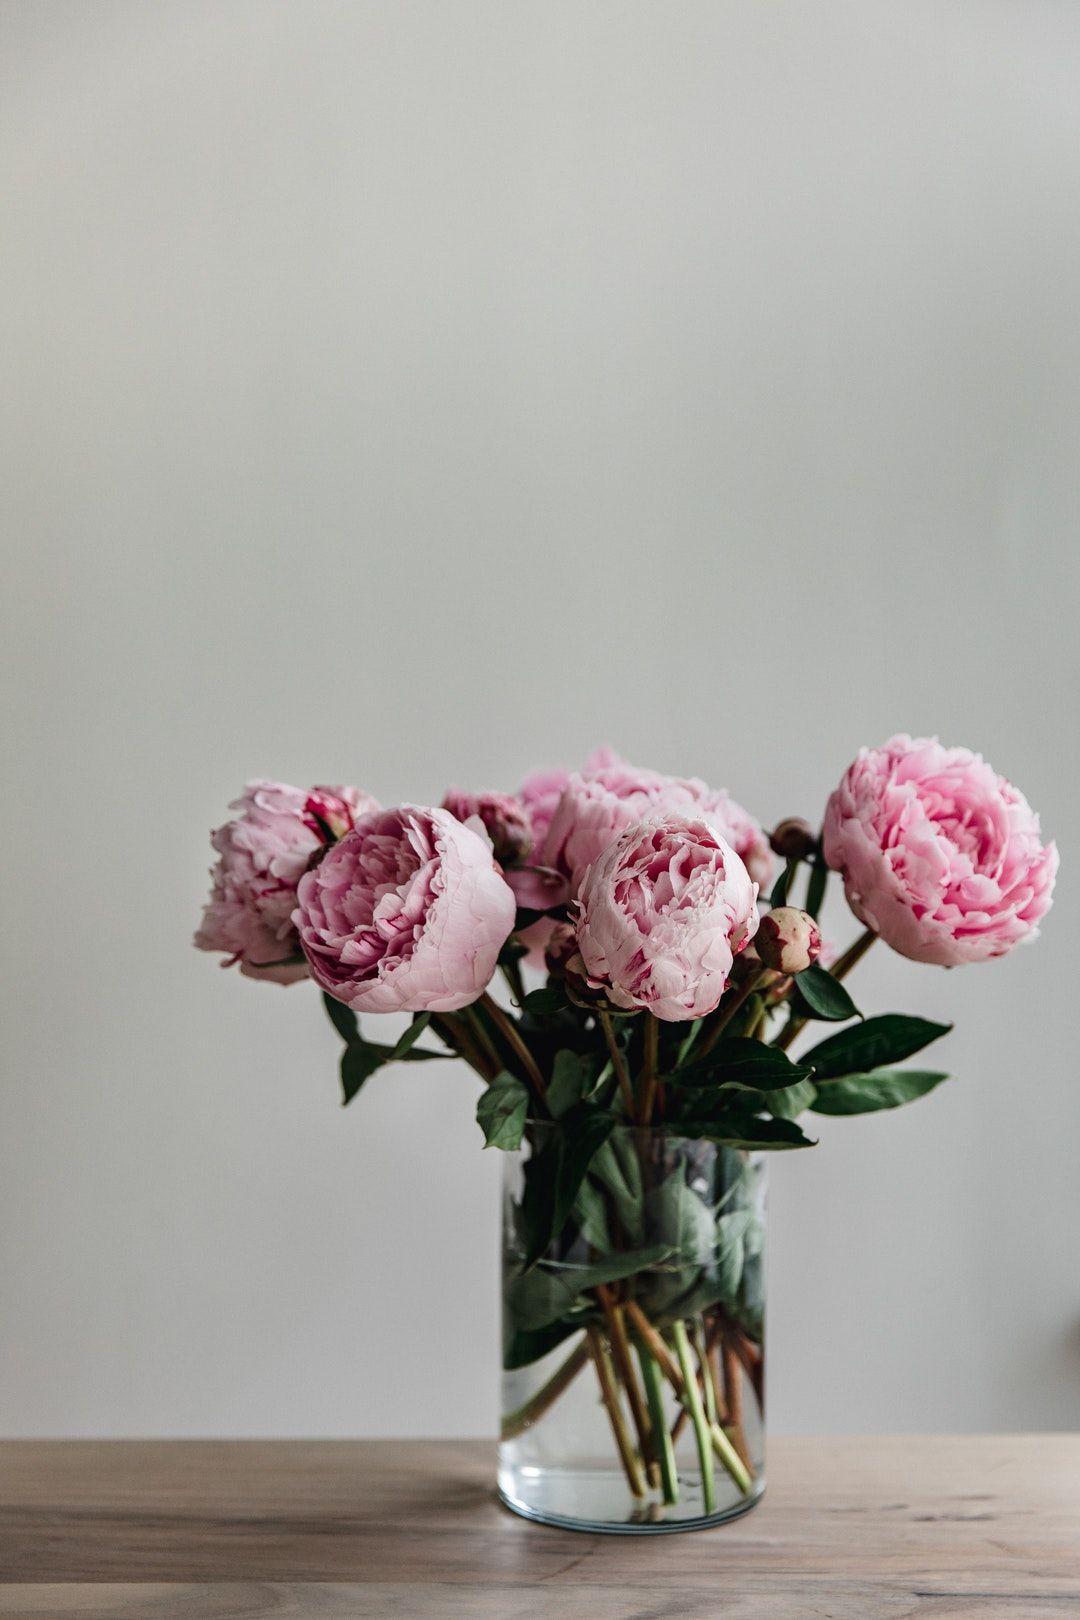 This Simple Image Of A Bunch Of Peoni Hd Photo By Patrick Langwallner Patresinger On Unsplash Flower Aesthetic Flower Vases Pink Flowers